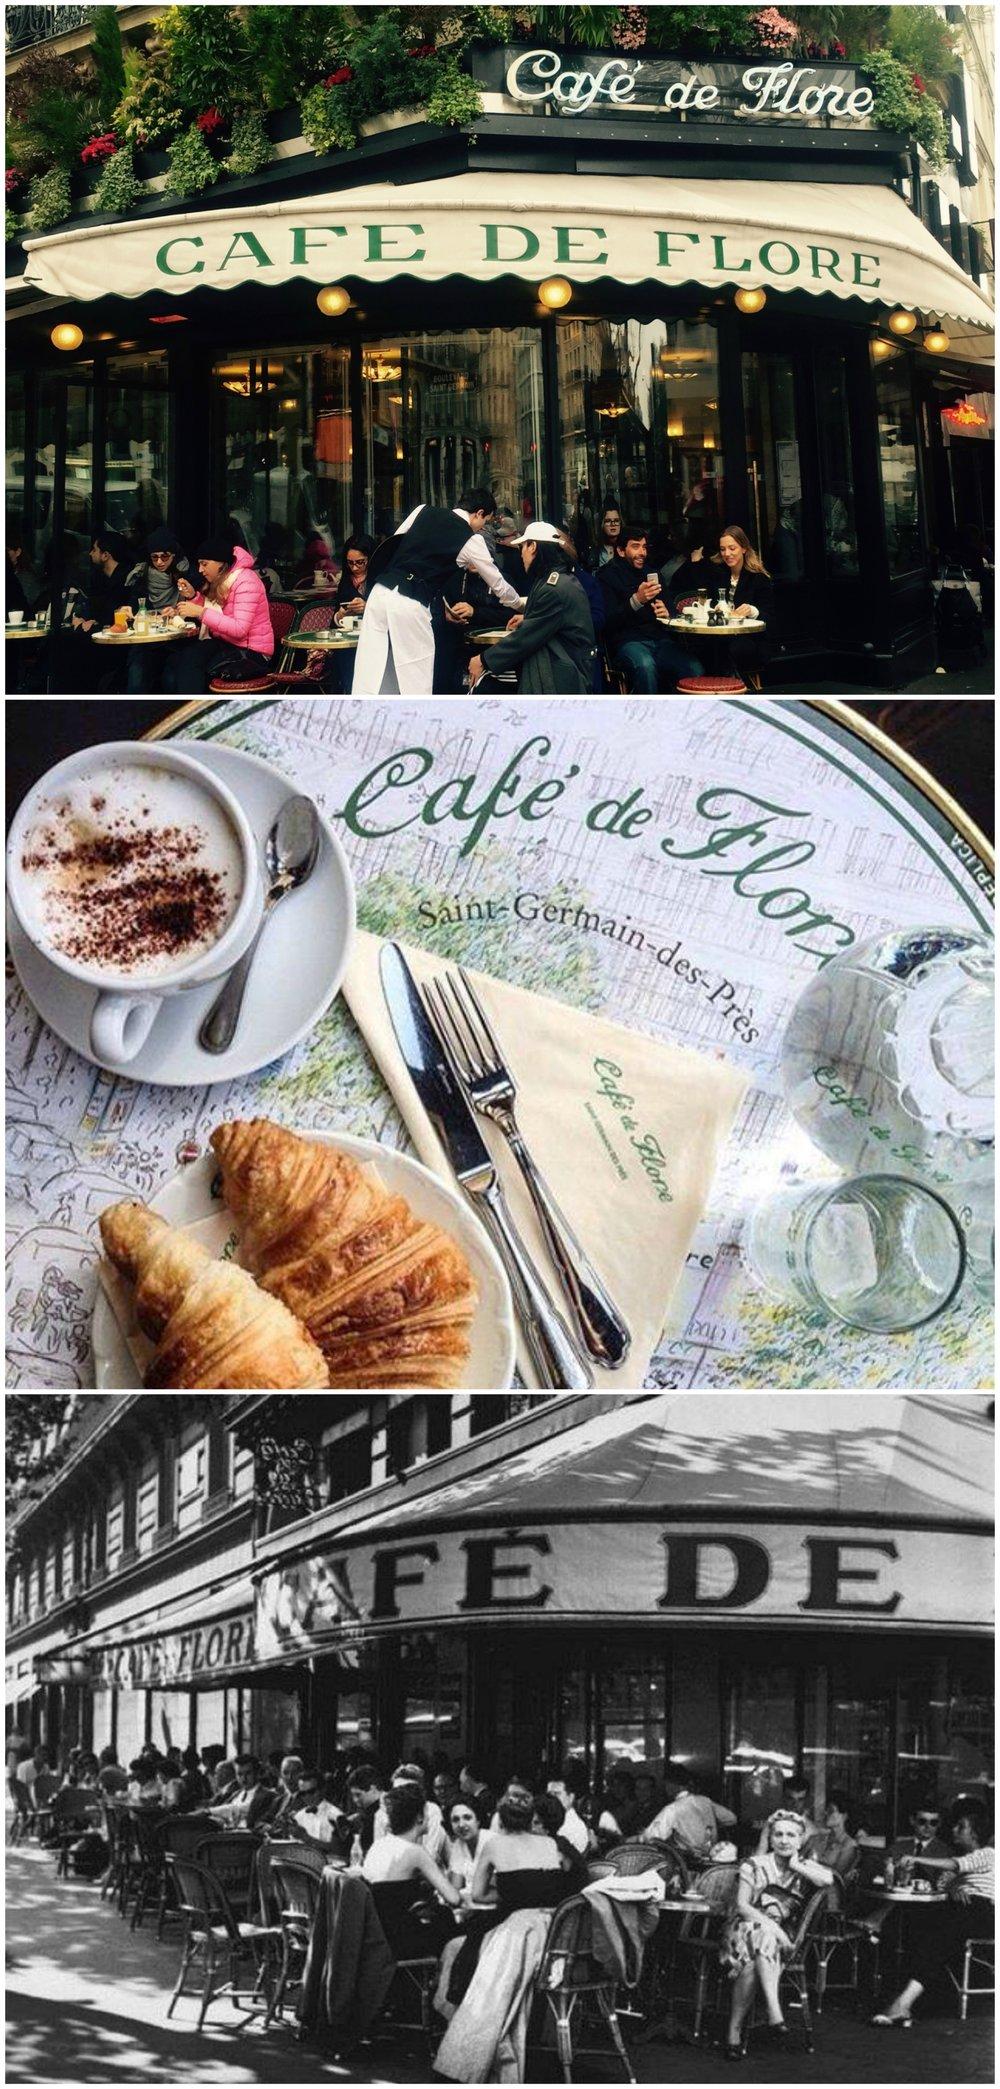 cafe-de-flore-2017.jpg